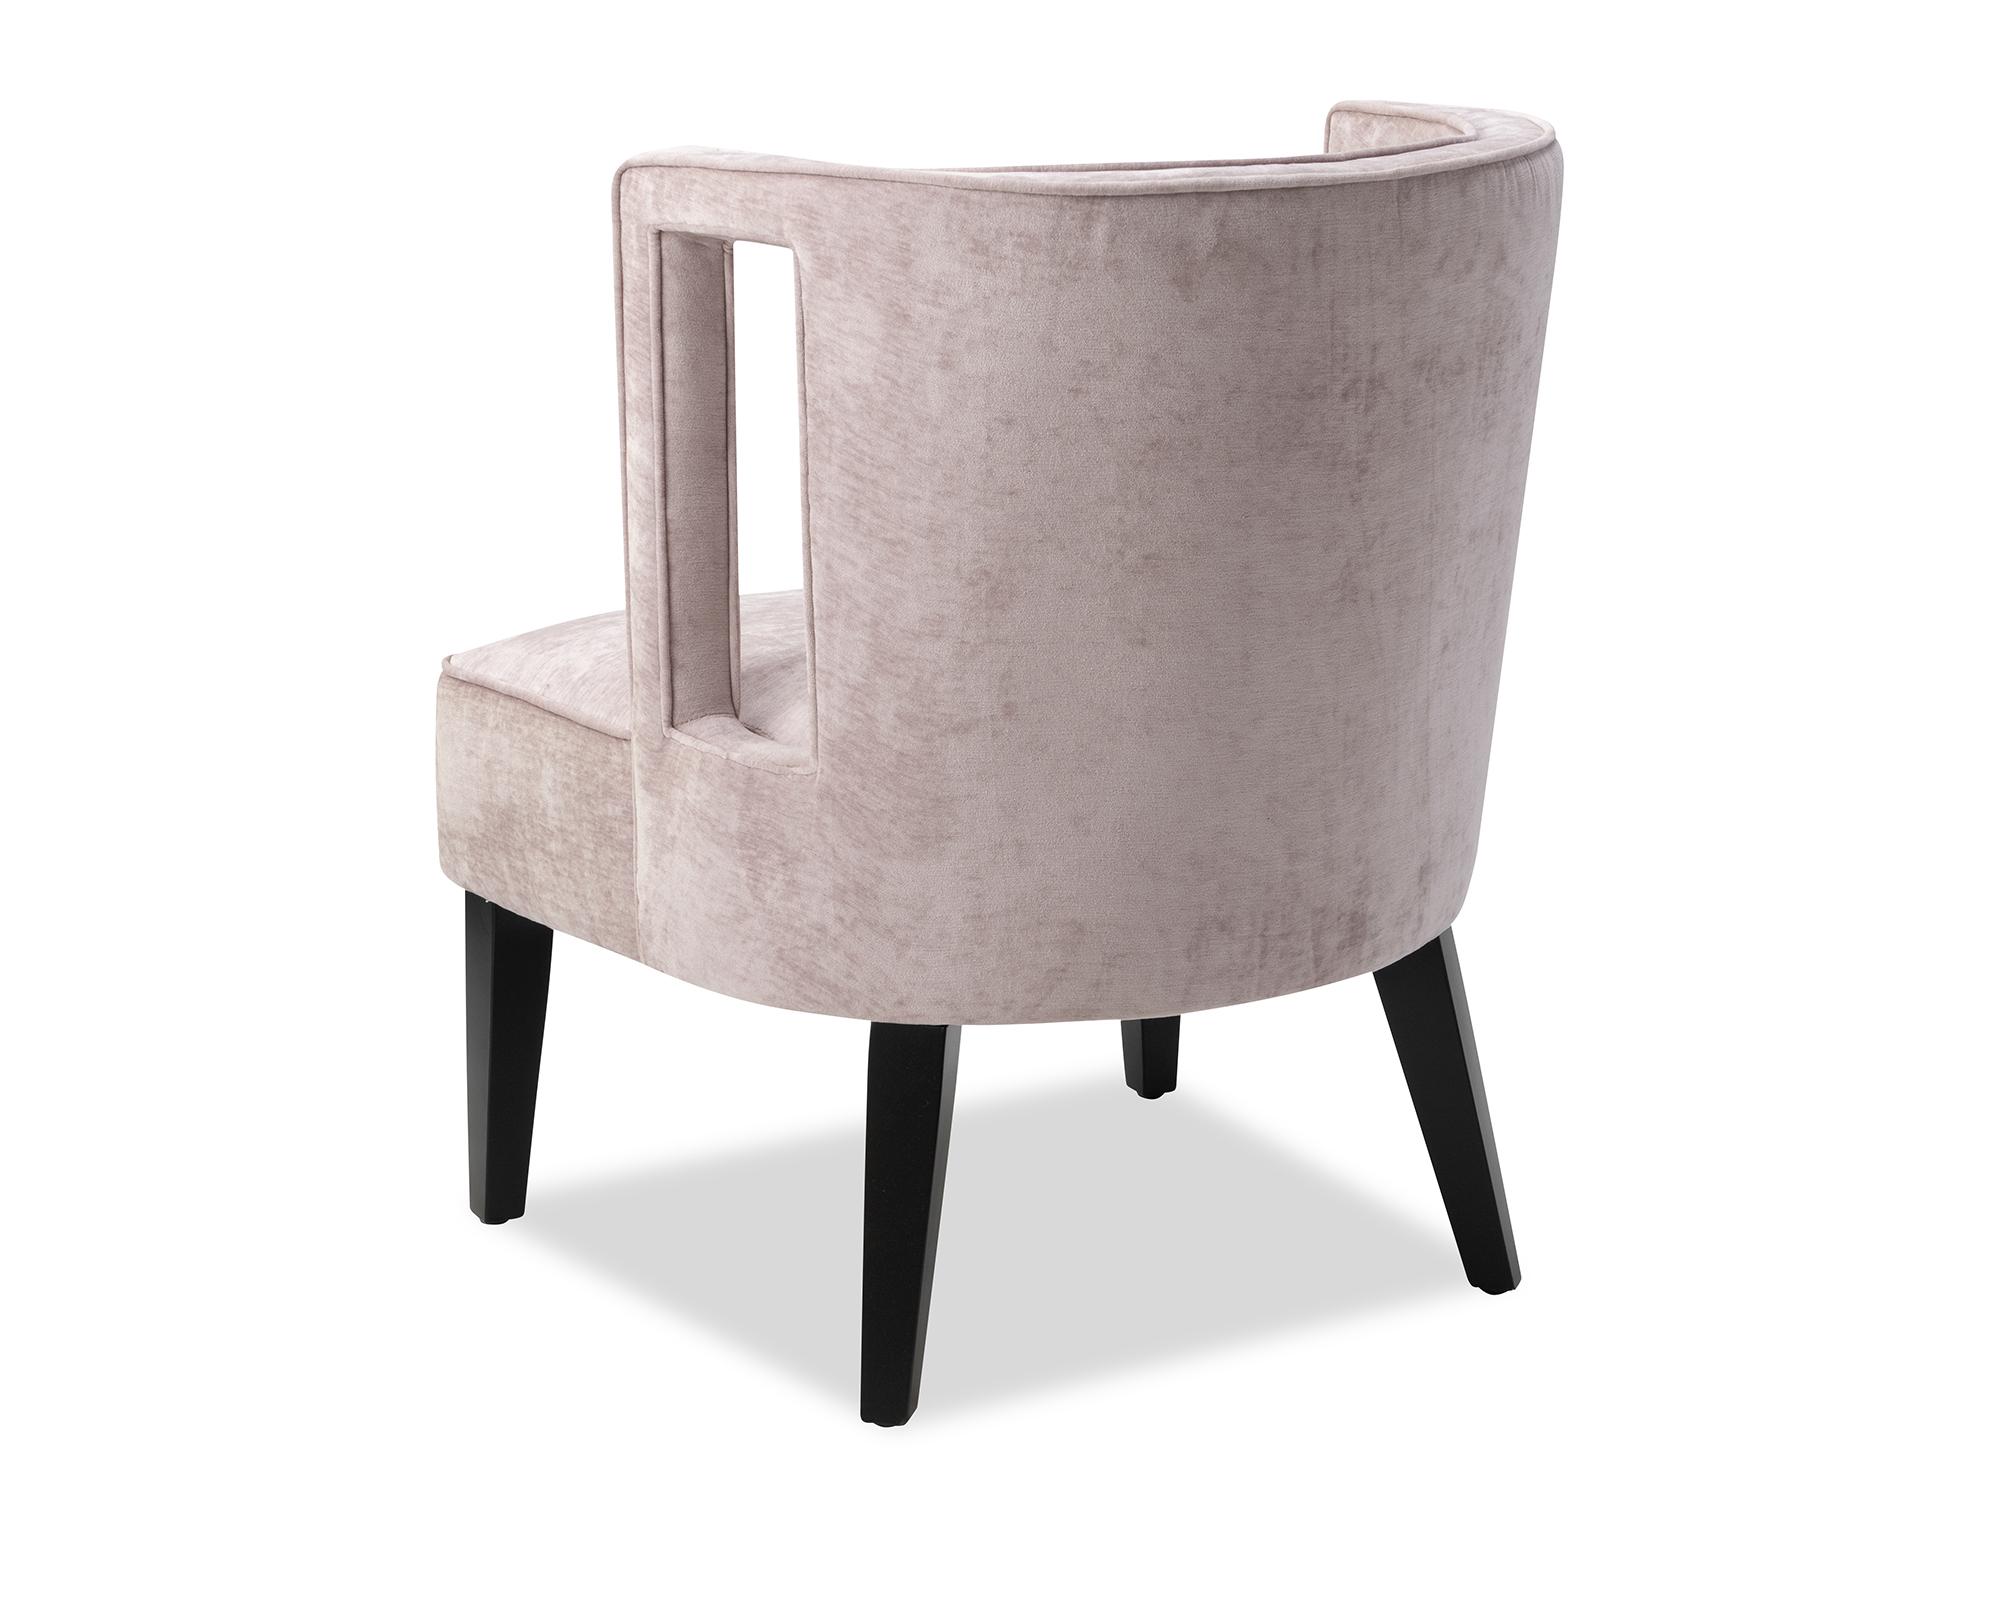 Liang & Eimil Cara Occasional Chair Lavender Velvet BH-OCH-083 (5)